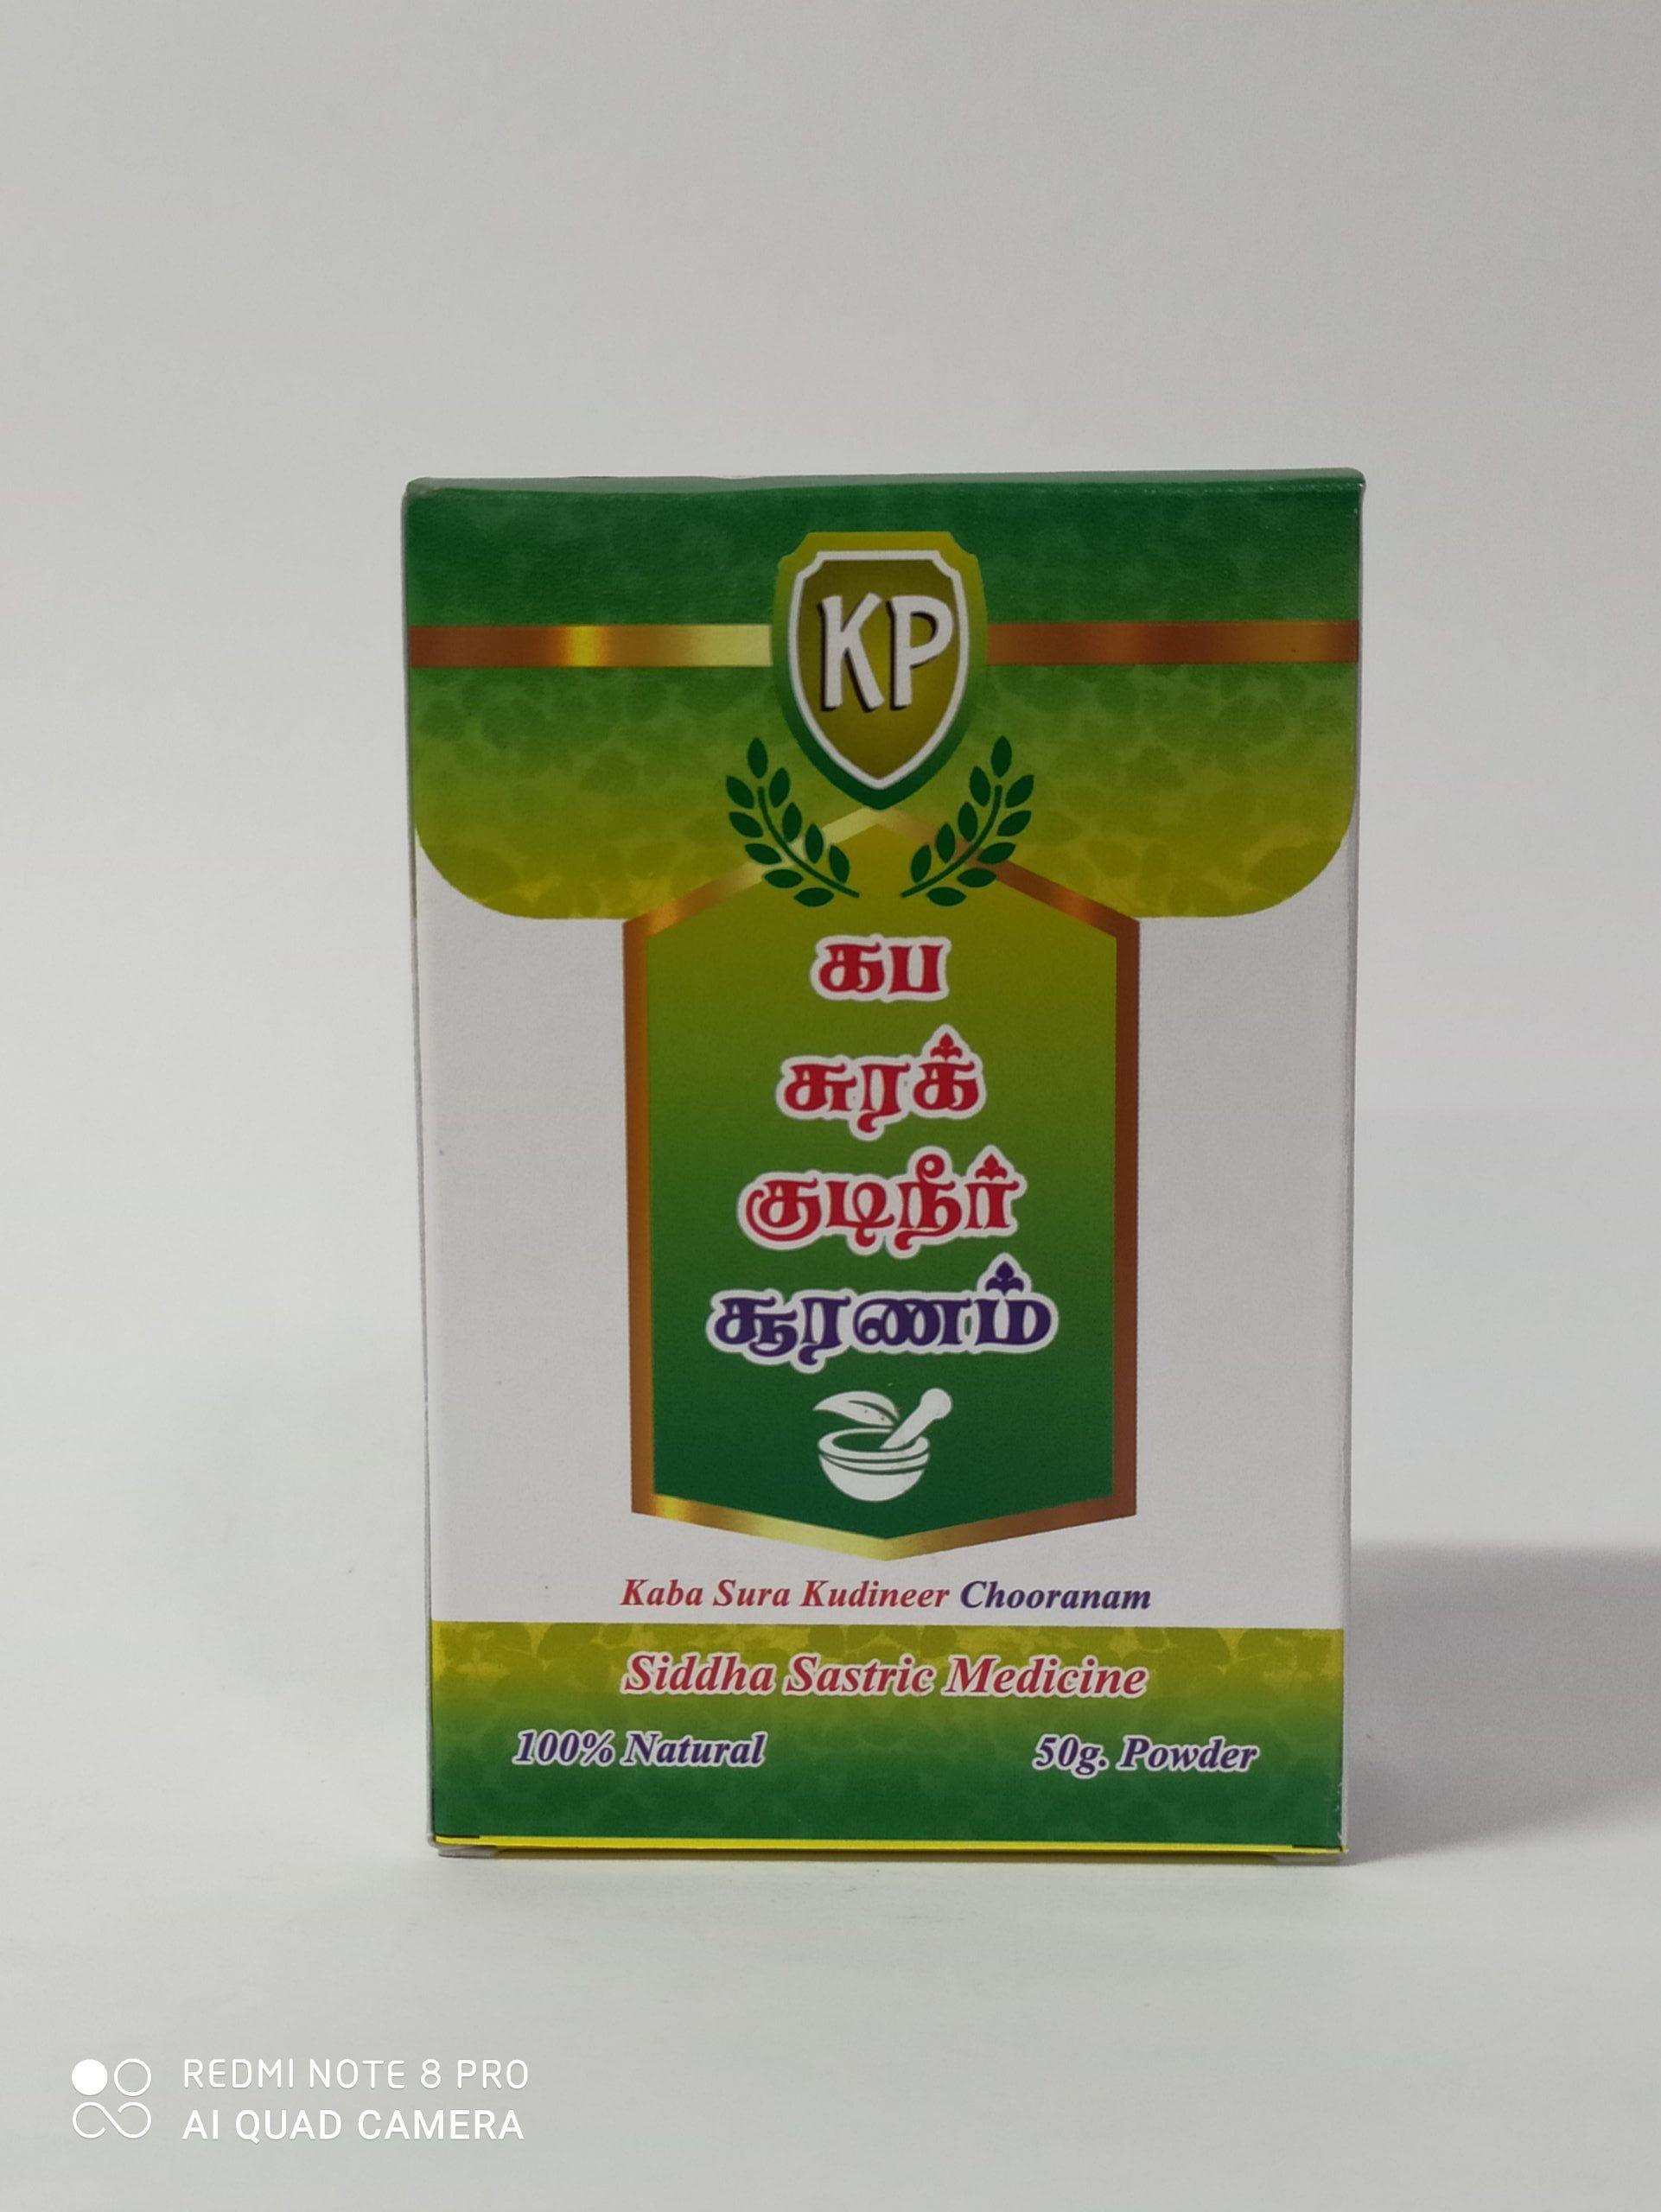 KP KABA SURA KUDINEER CHOORANAM 50GM